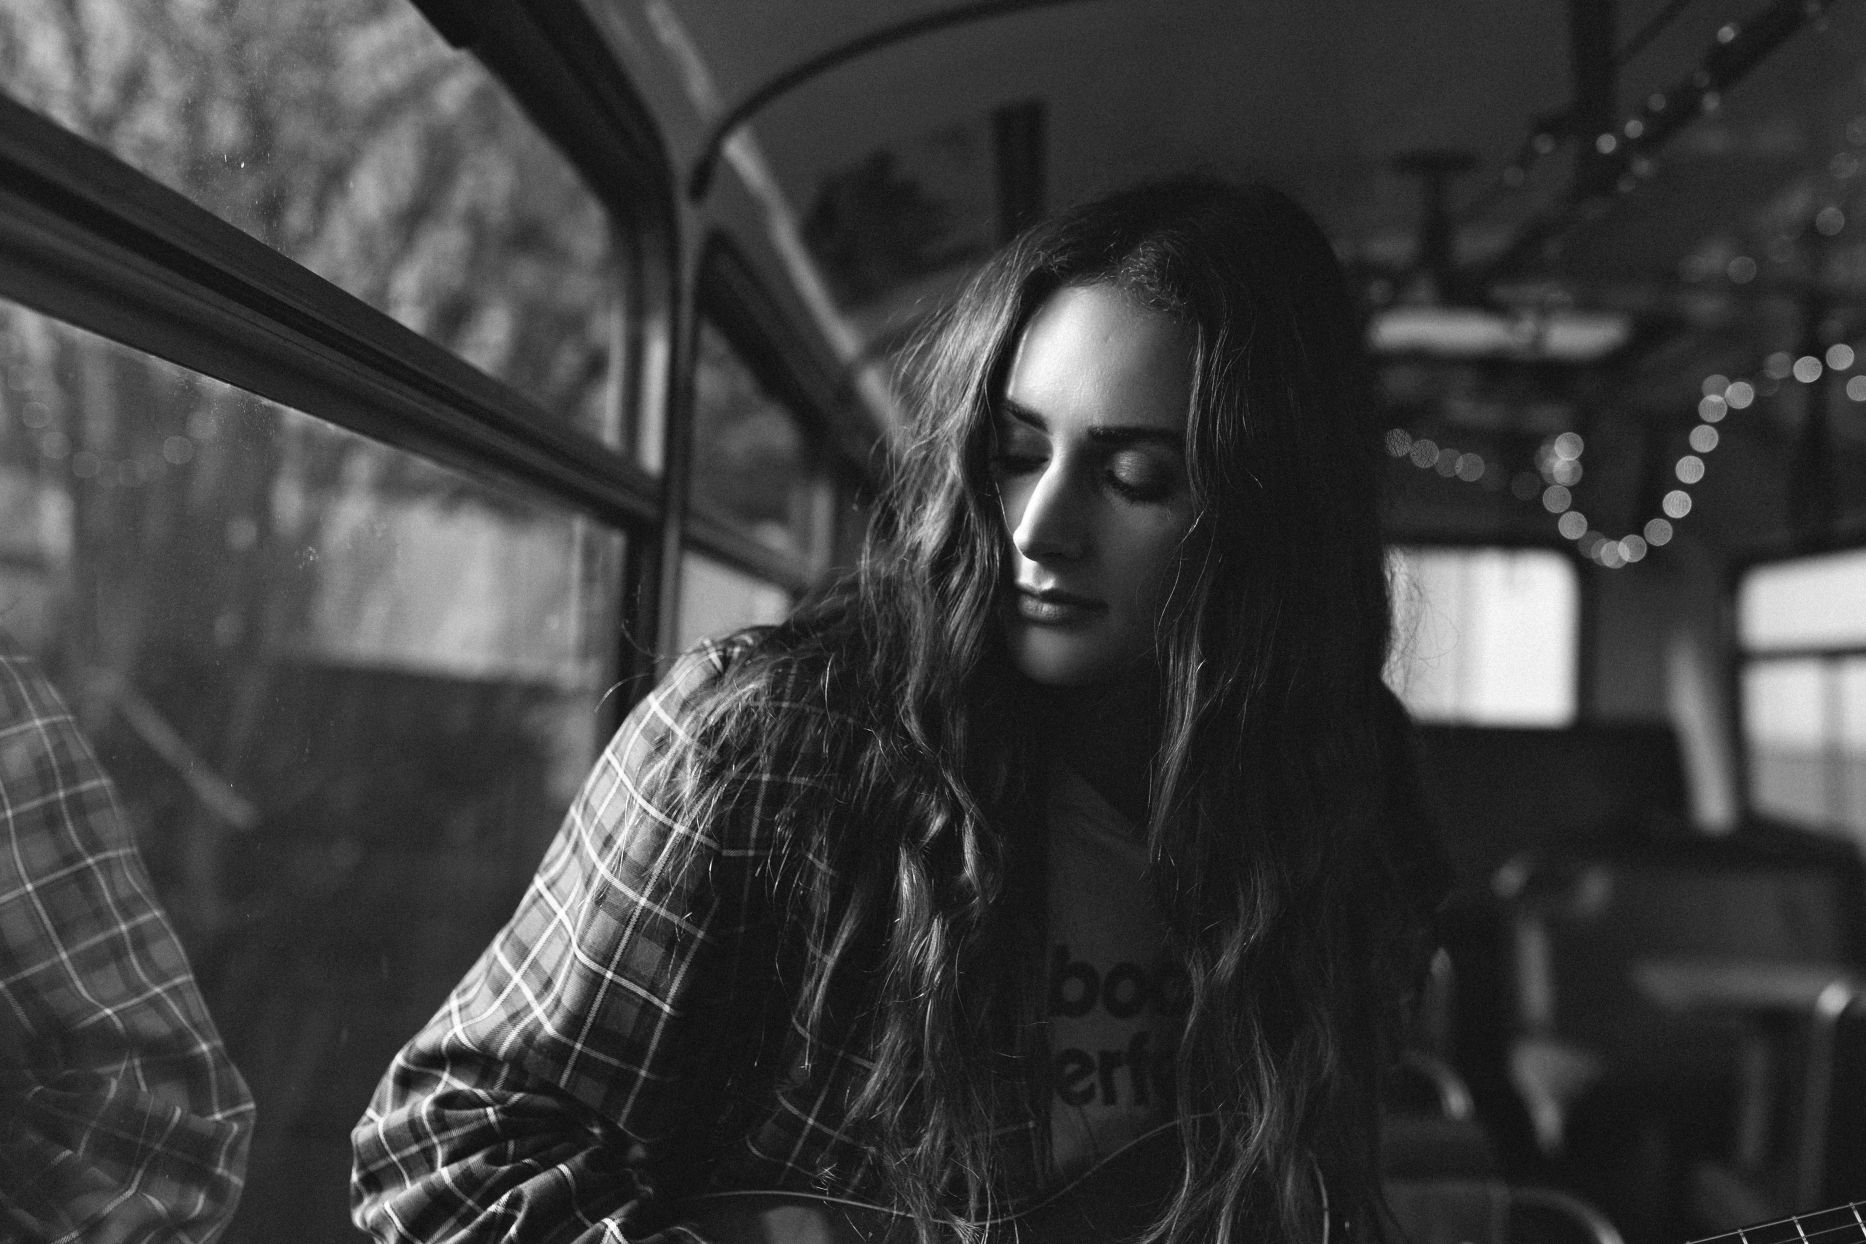 musician-woman-lasca-siida-photography-hobart-portrait.jpg